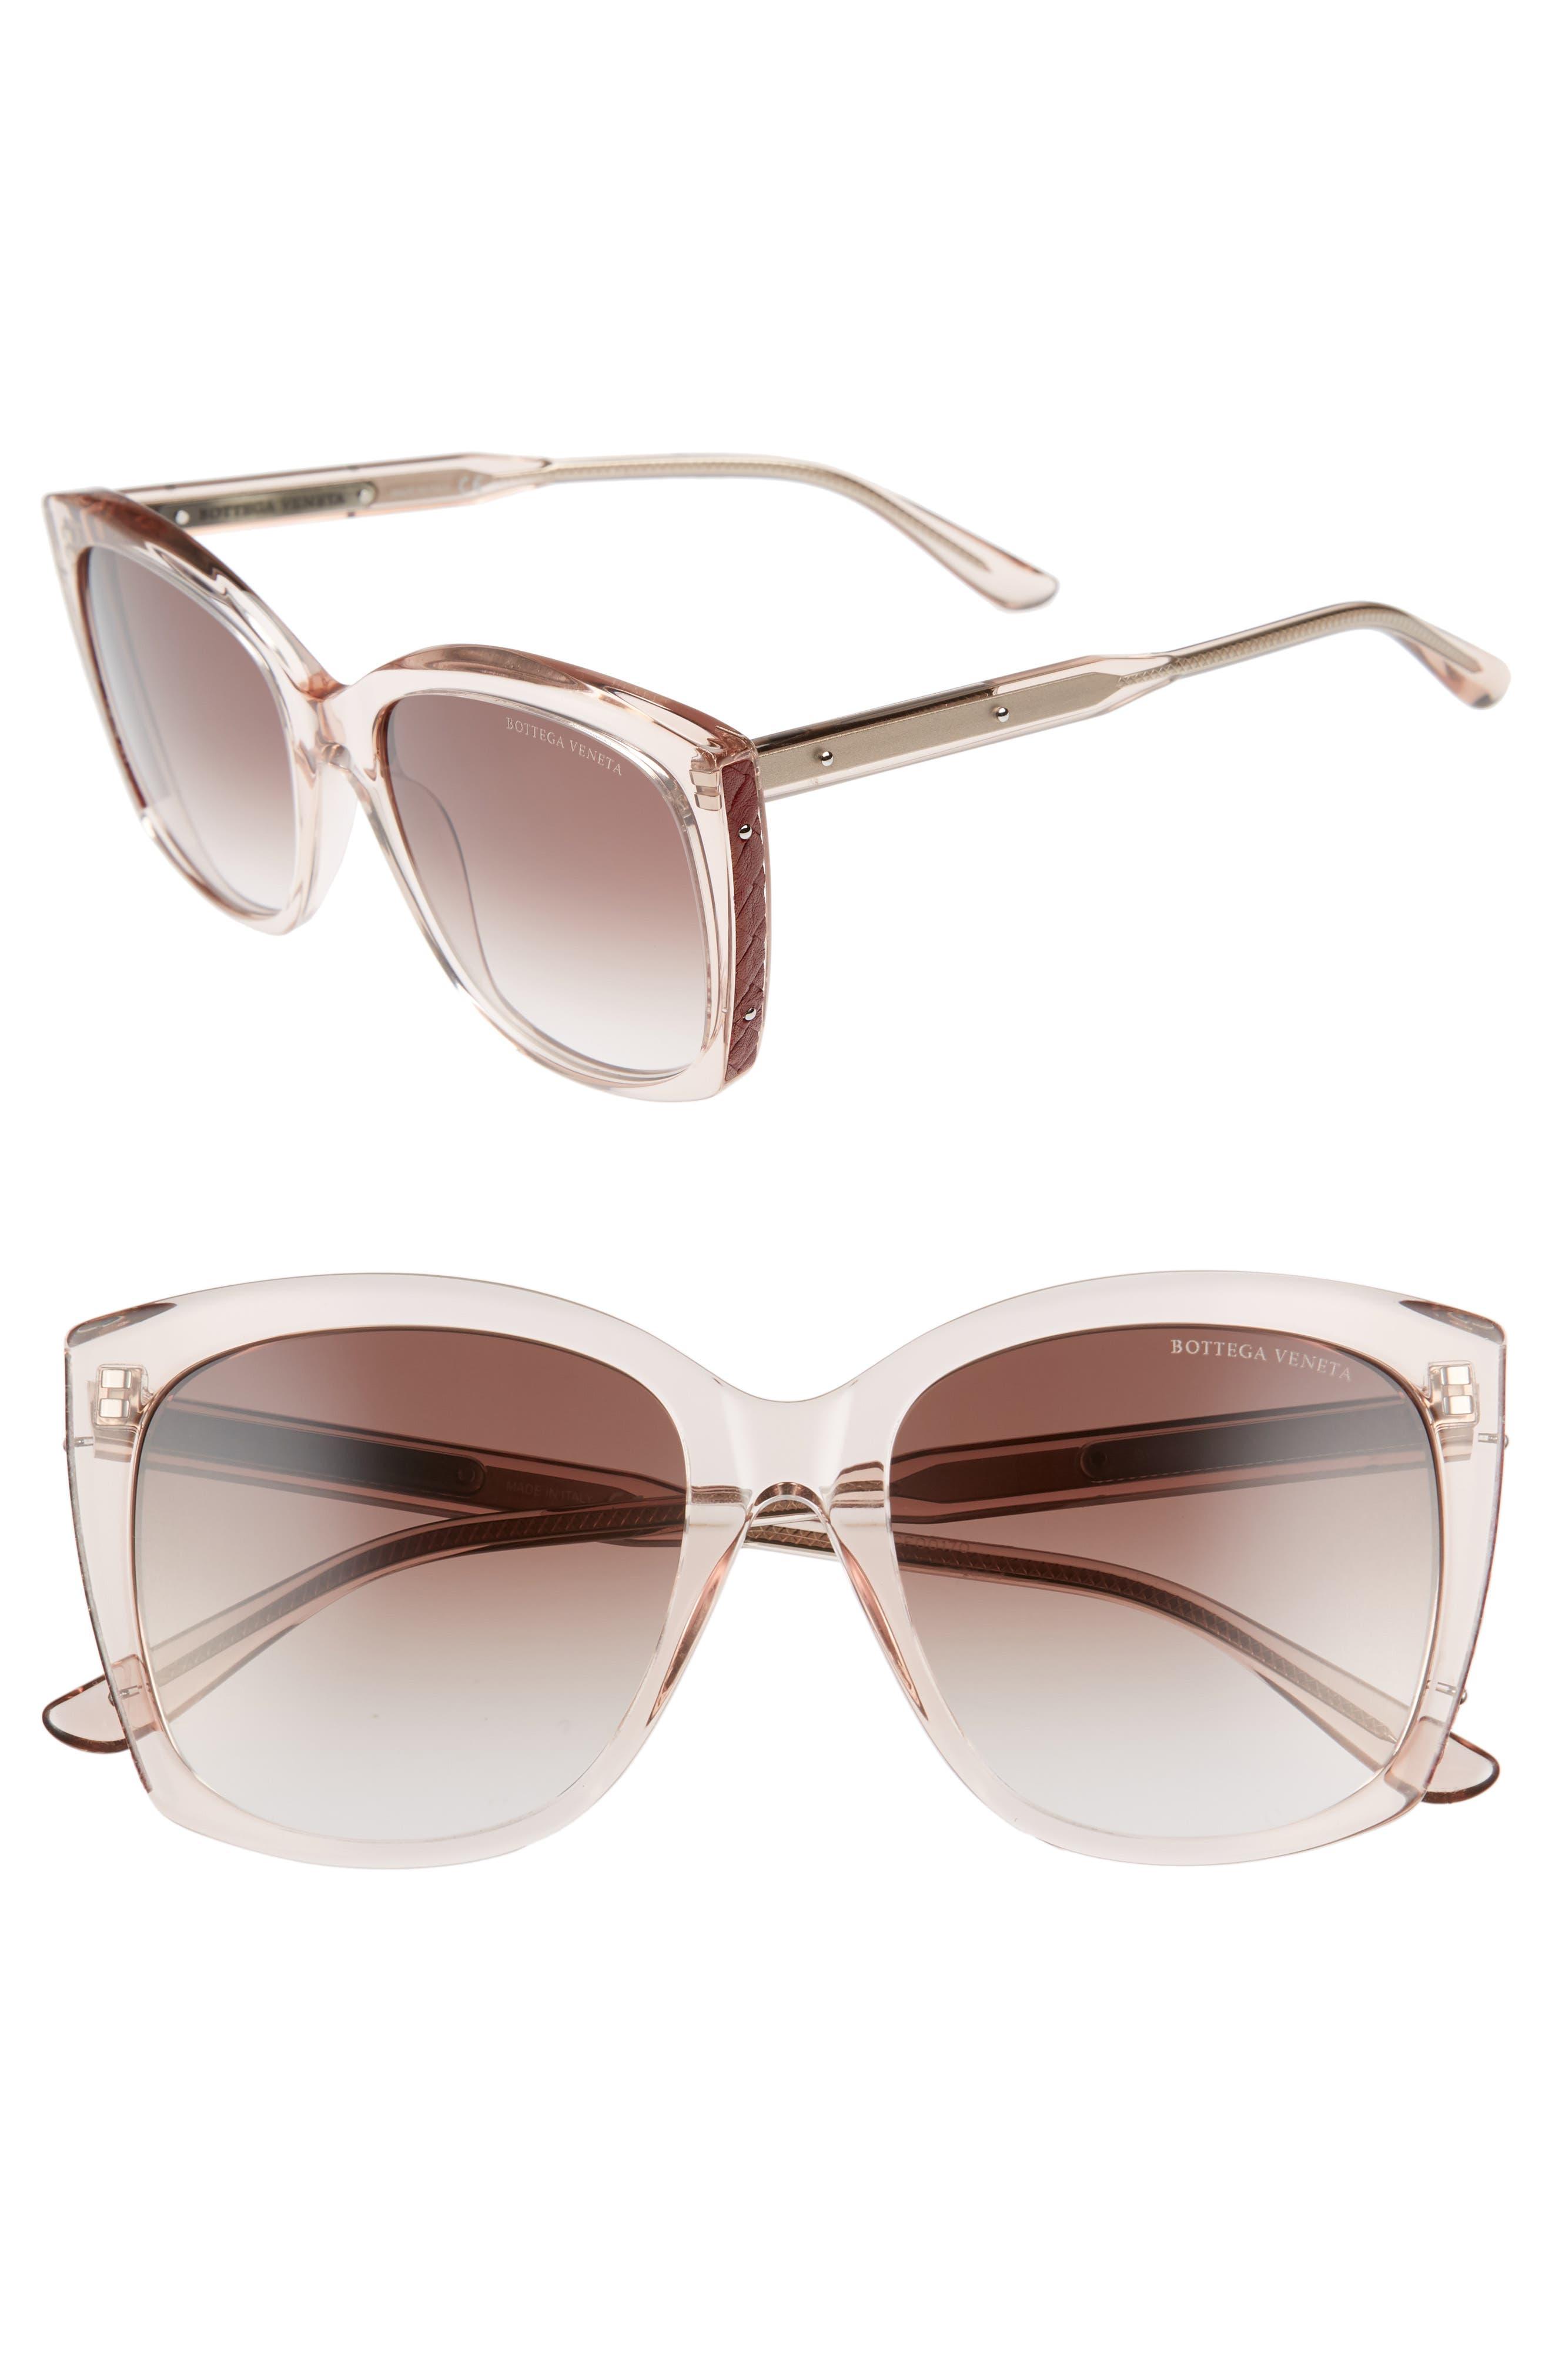 55mm Cat Eye Sunglasses,                             Main thumbnail 1, color,                             Pink